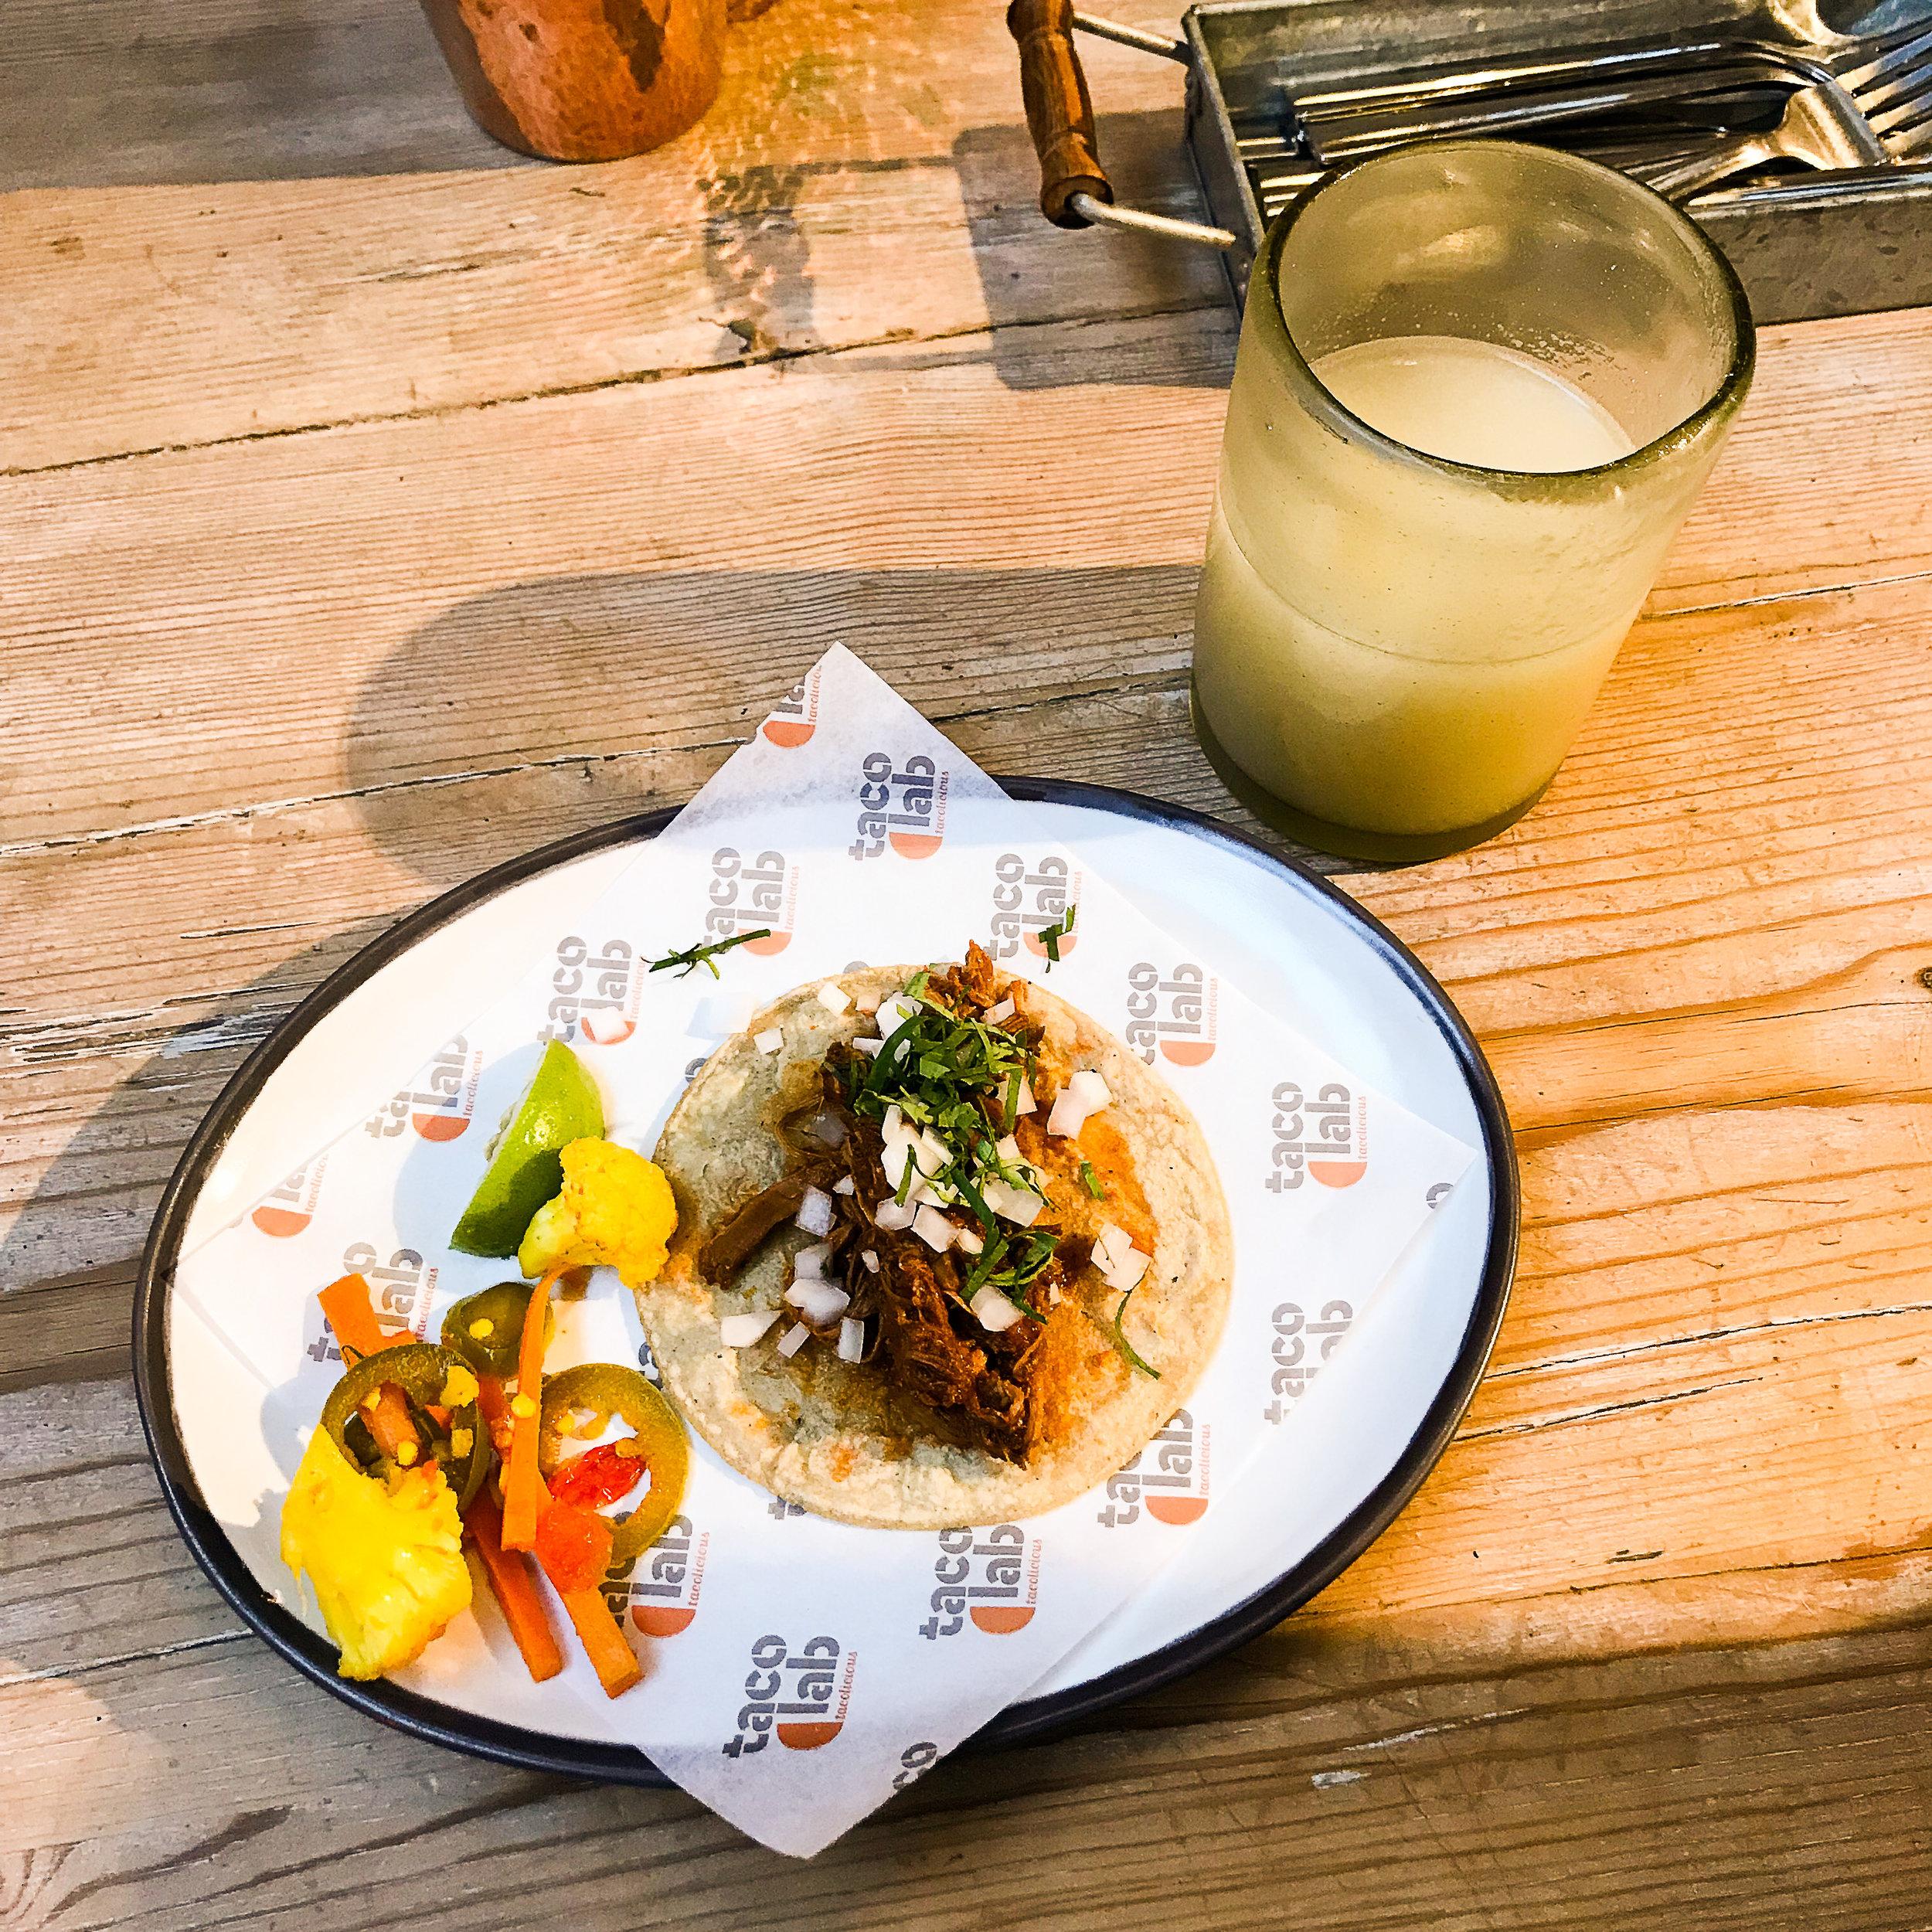 mexican-food-san-miguel-de-allende-restuarants-coffee-cafes-9.jpg